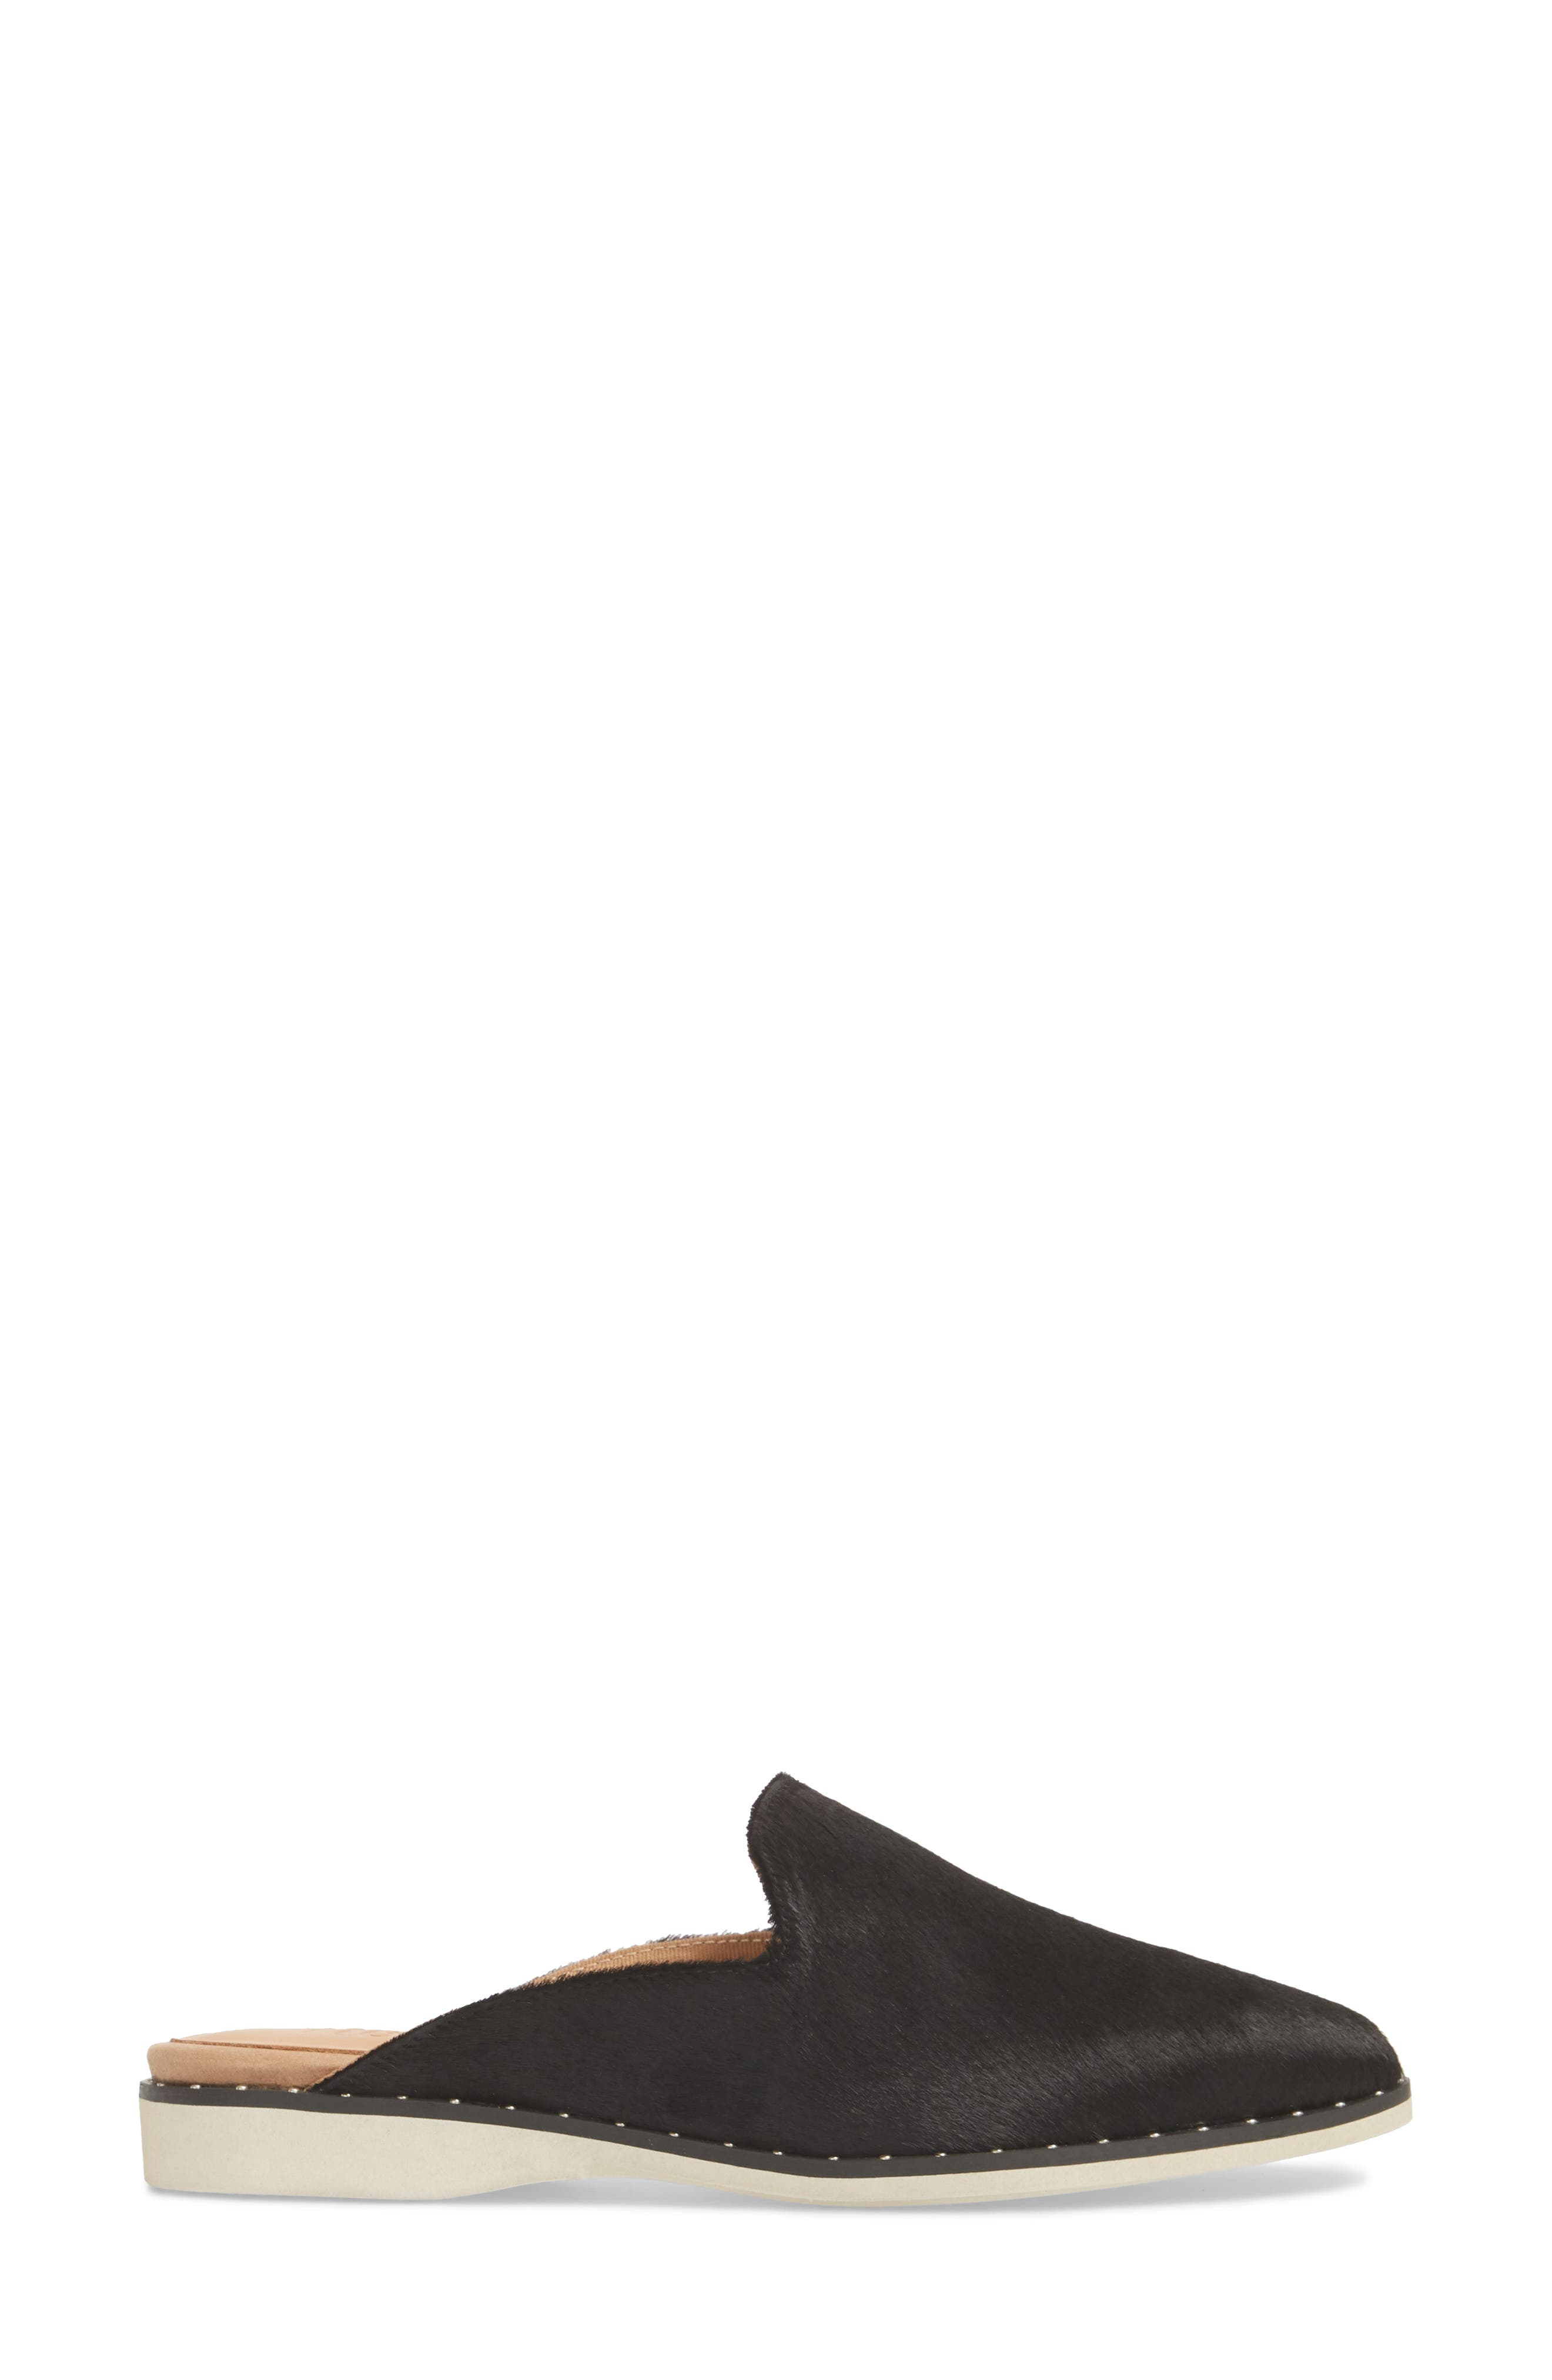 Madison Studded Genuine Calf Hair Loafer Mule,                             Alternate thumbnail 4, color,                             Black Calf Hair